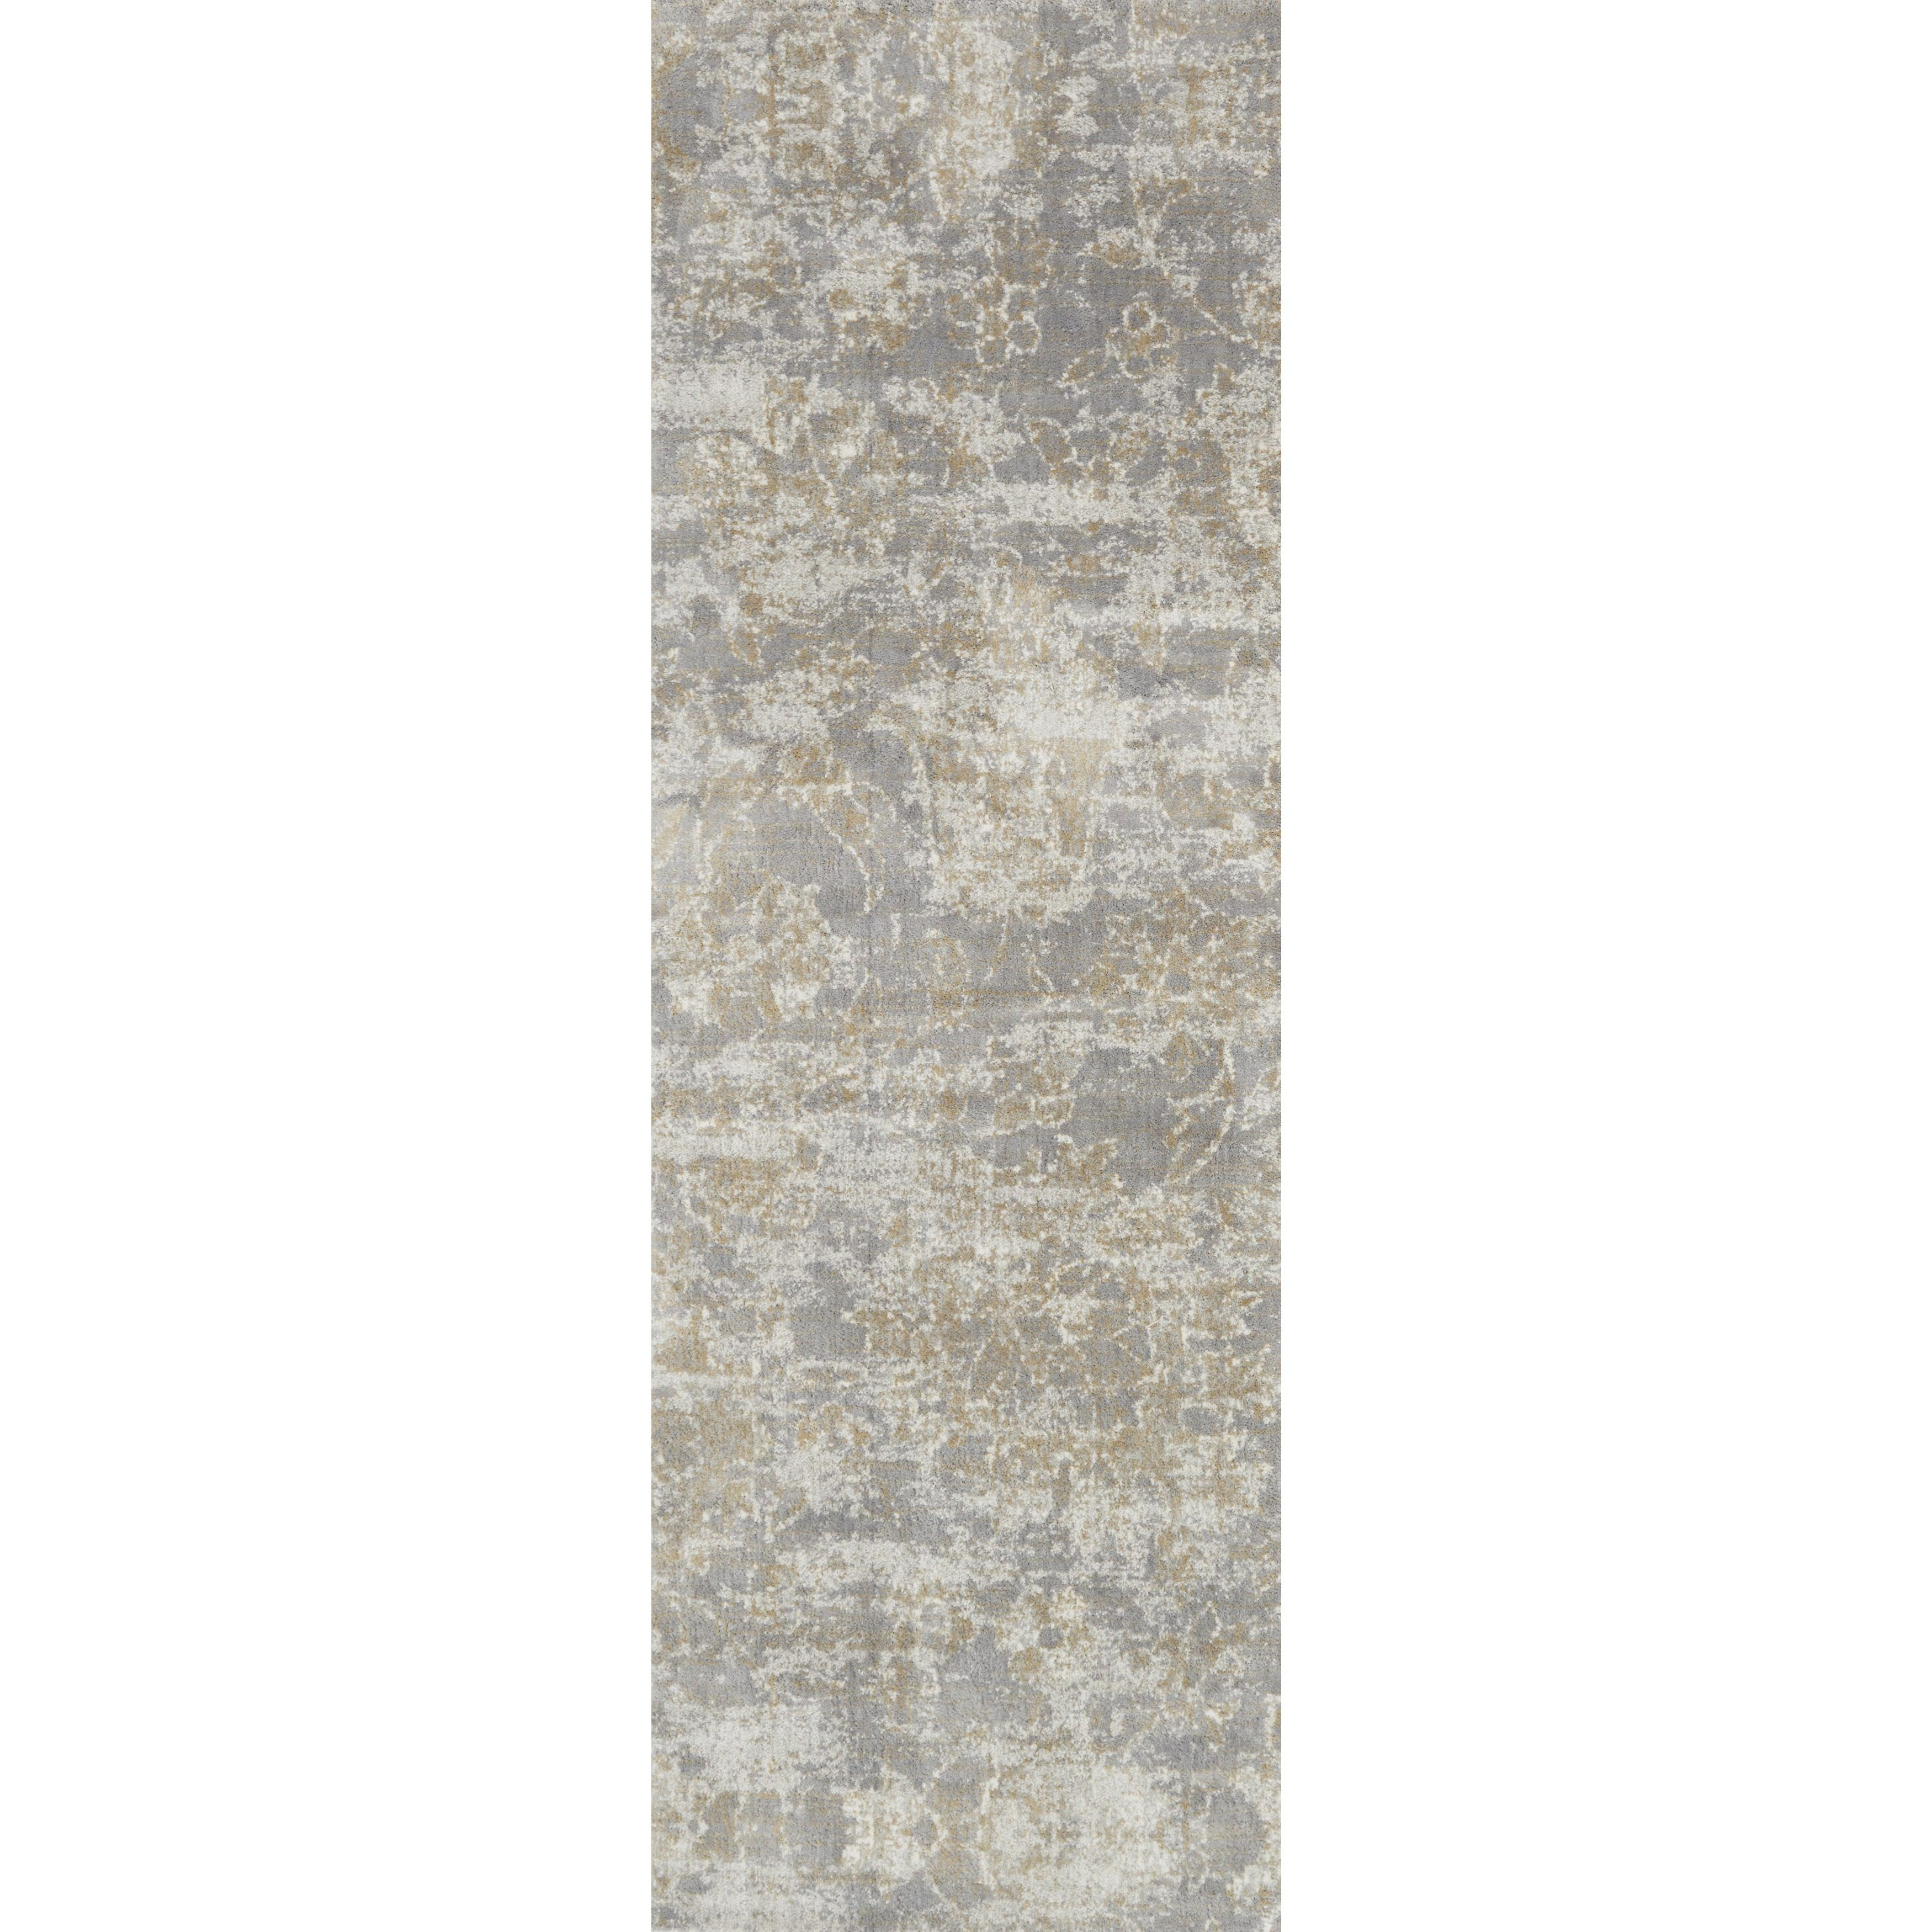 Alexander Home Microfiber Verona Slate Floral Rug 2 7 X 8